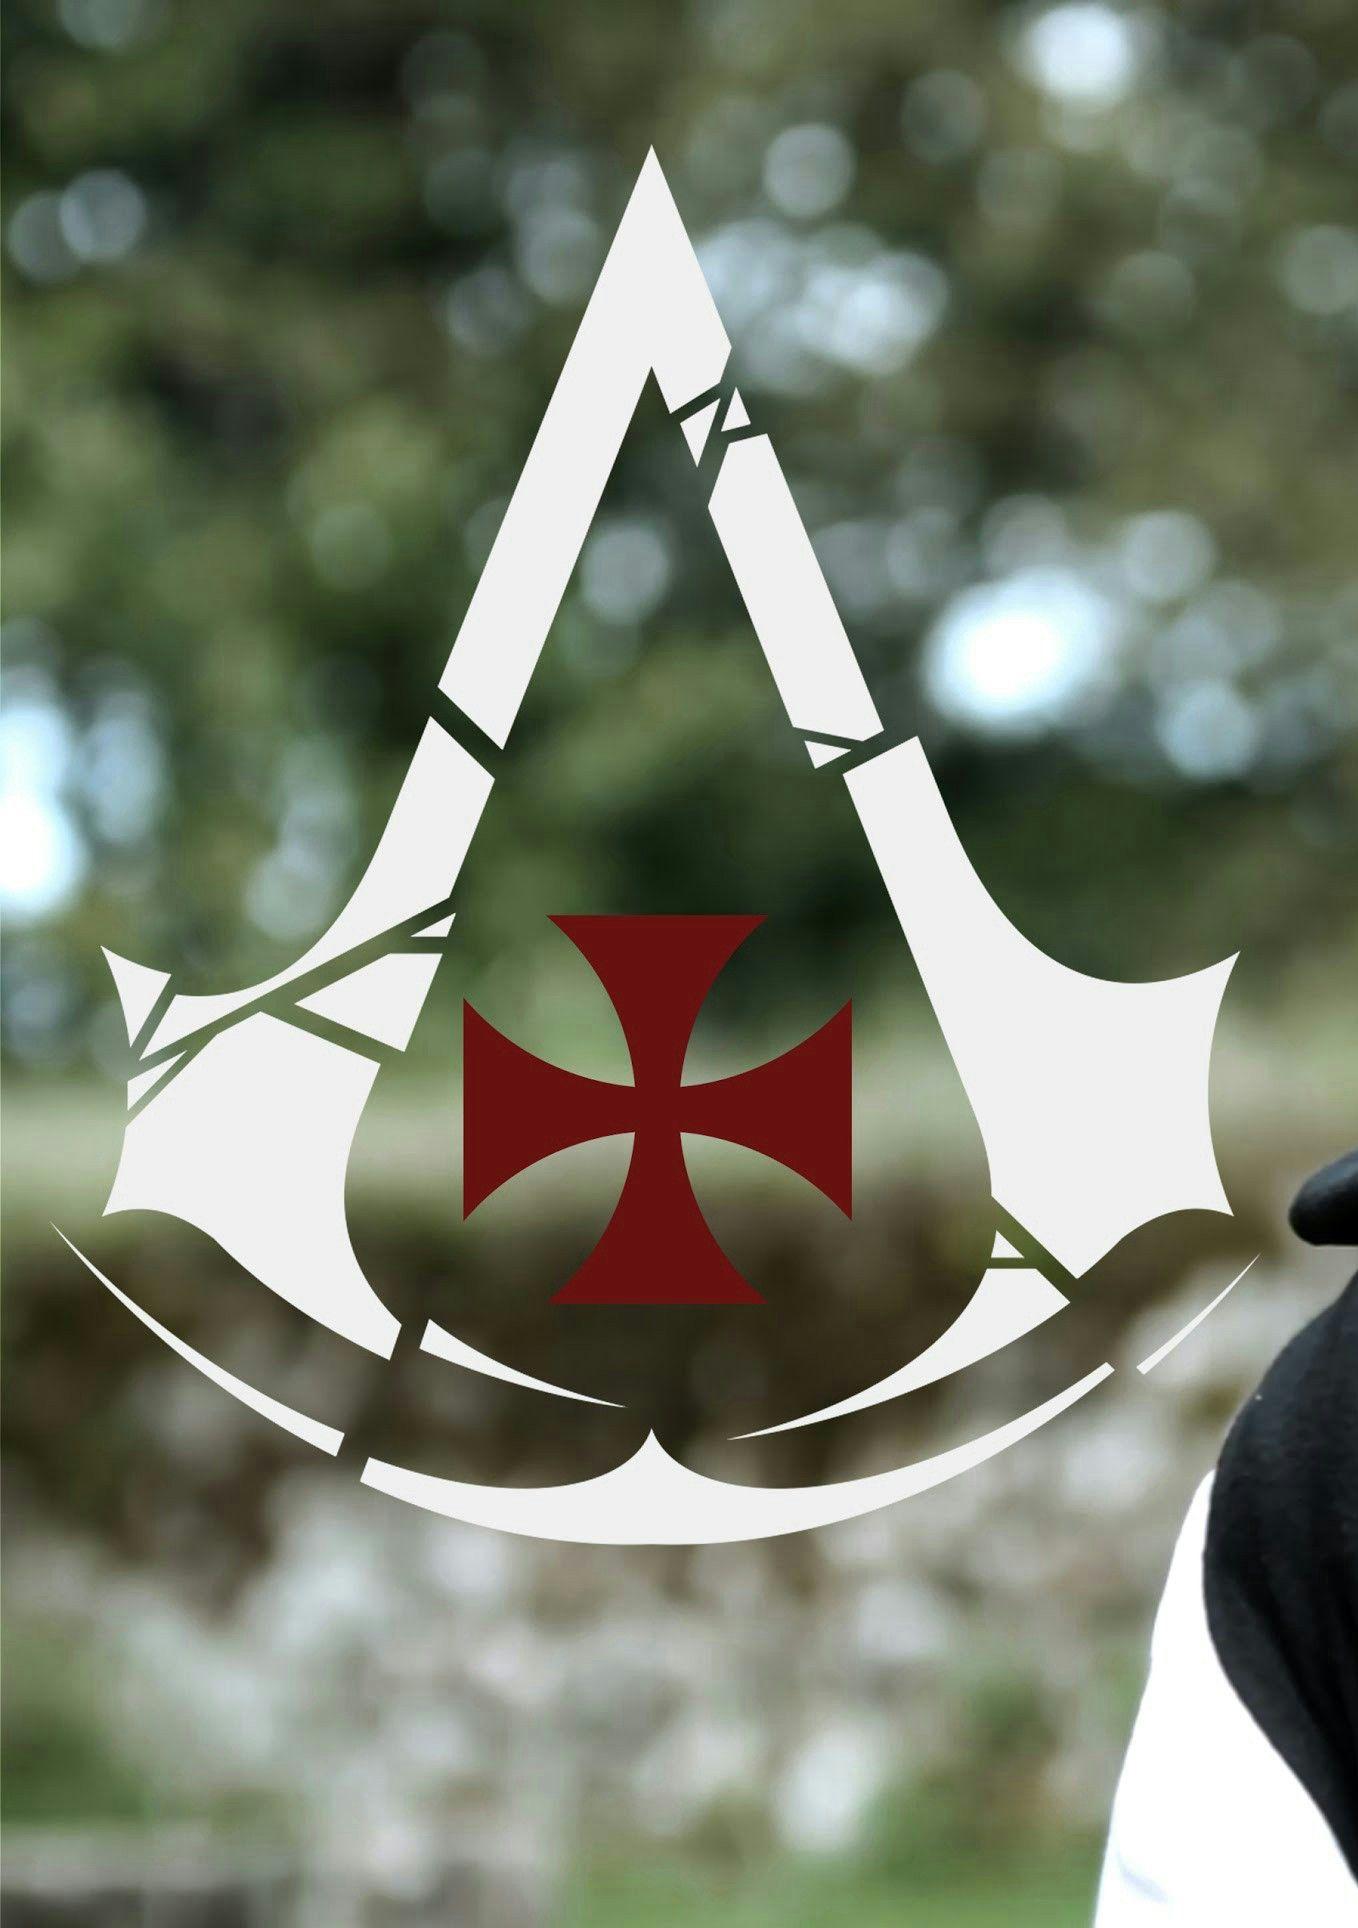 Pin by Kaj on Assassin's Creed Assassins creed tattoo